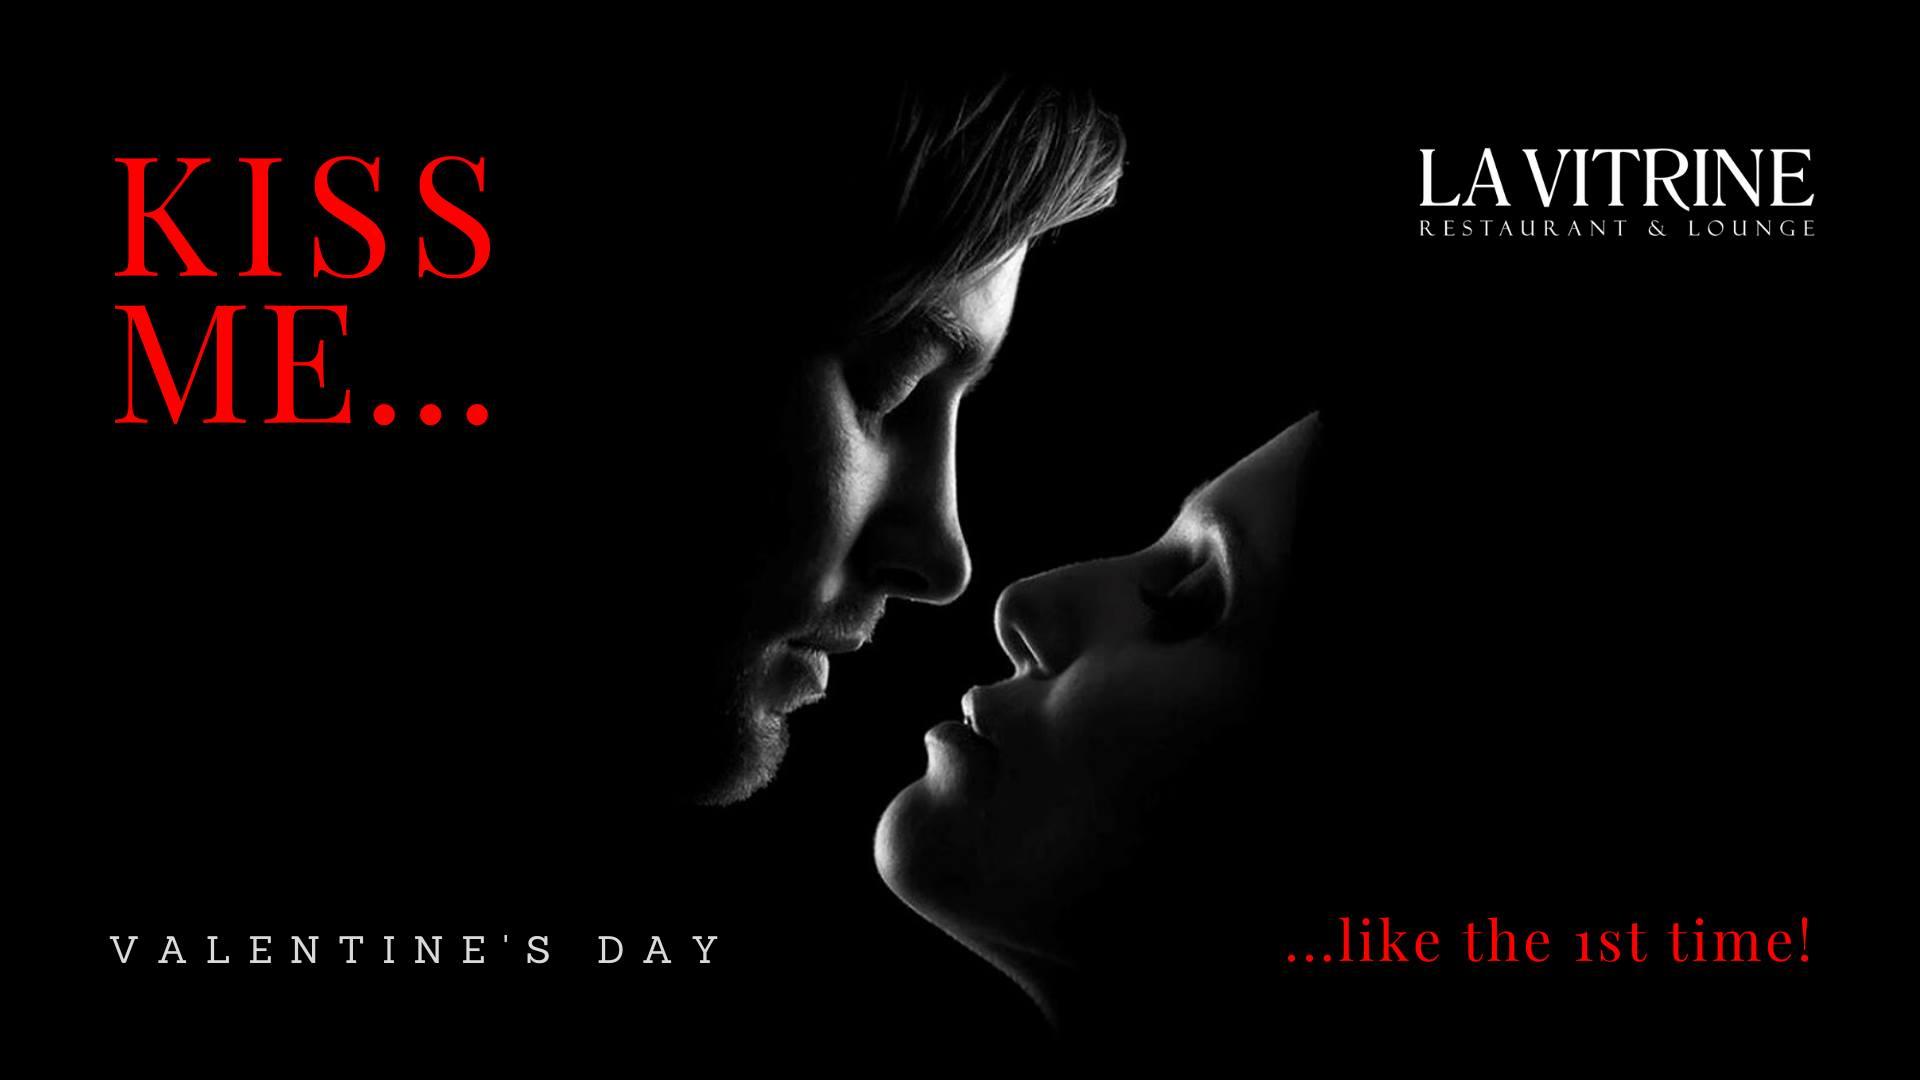 kiss me la vitrine weekend 14-16 februarie